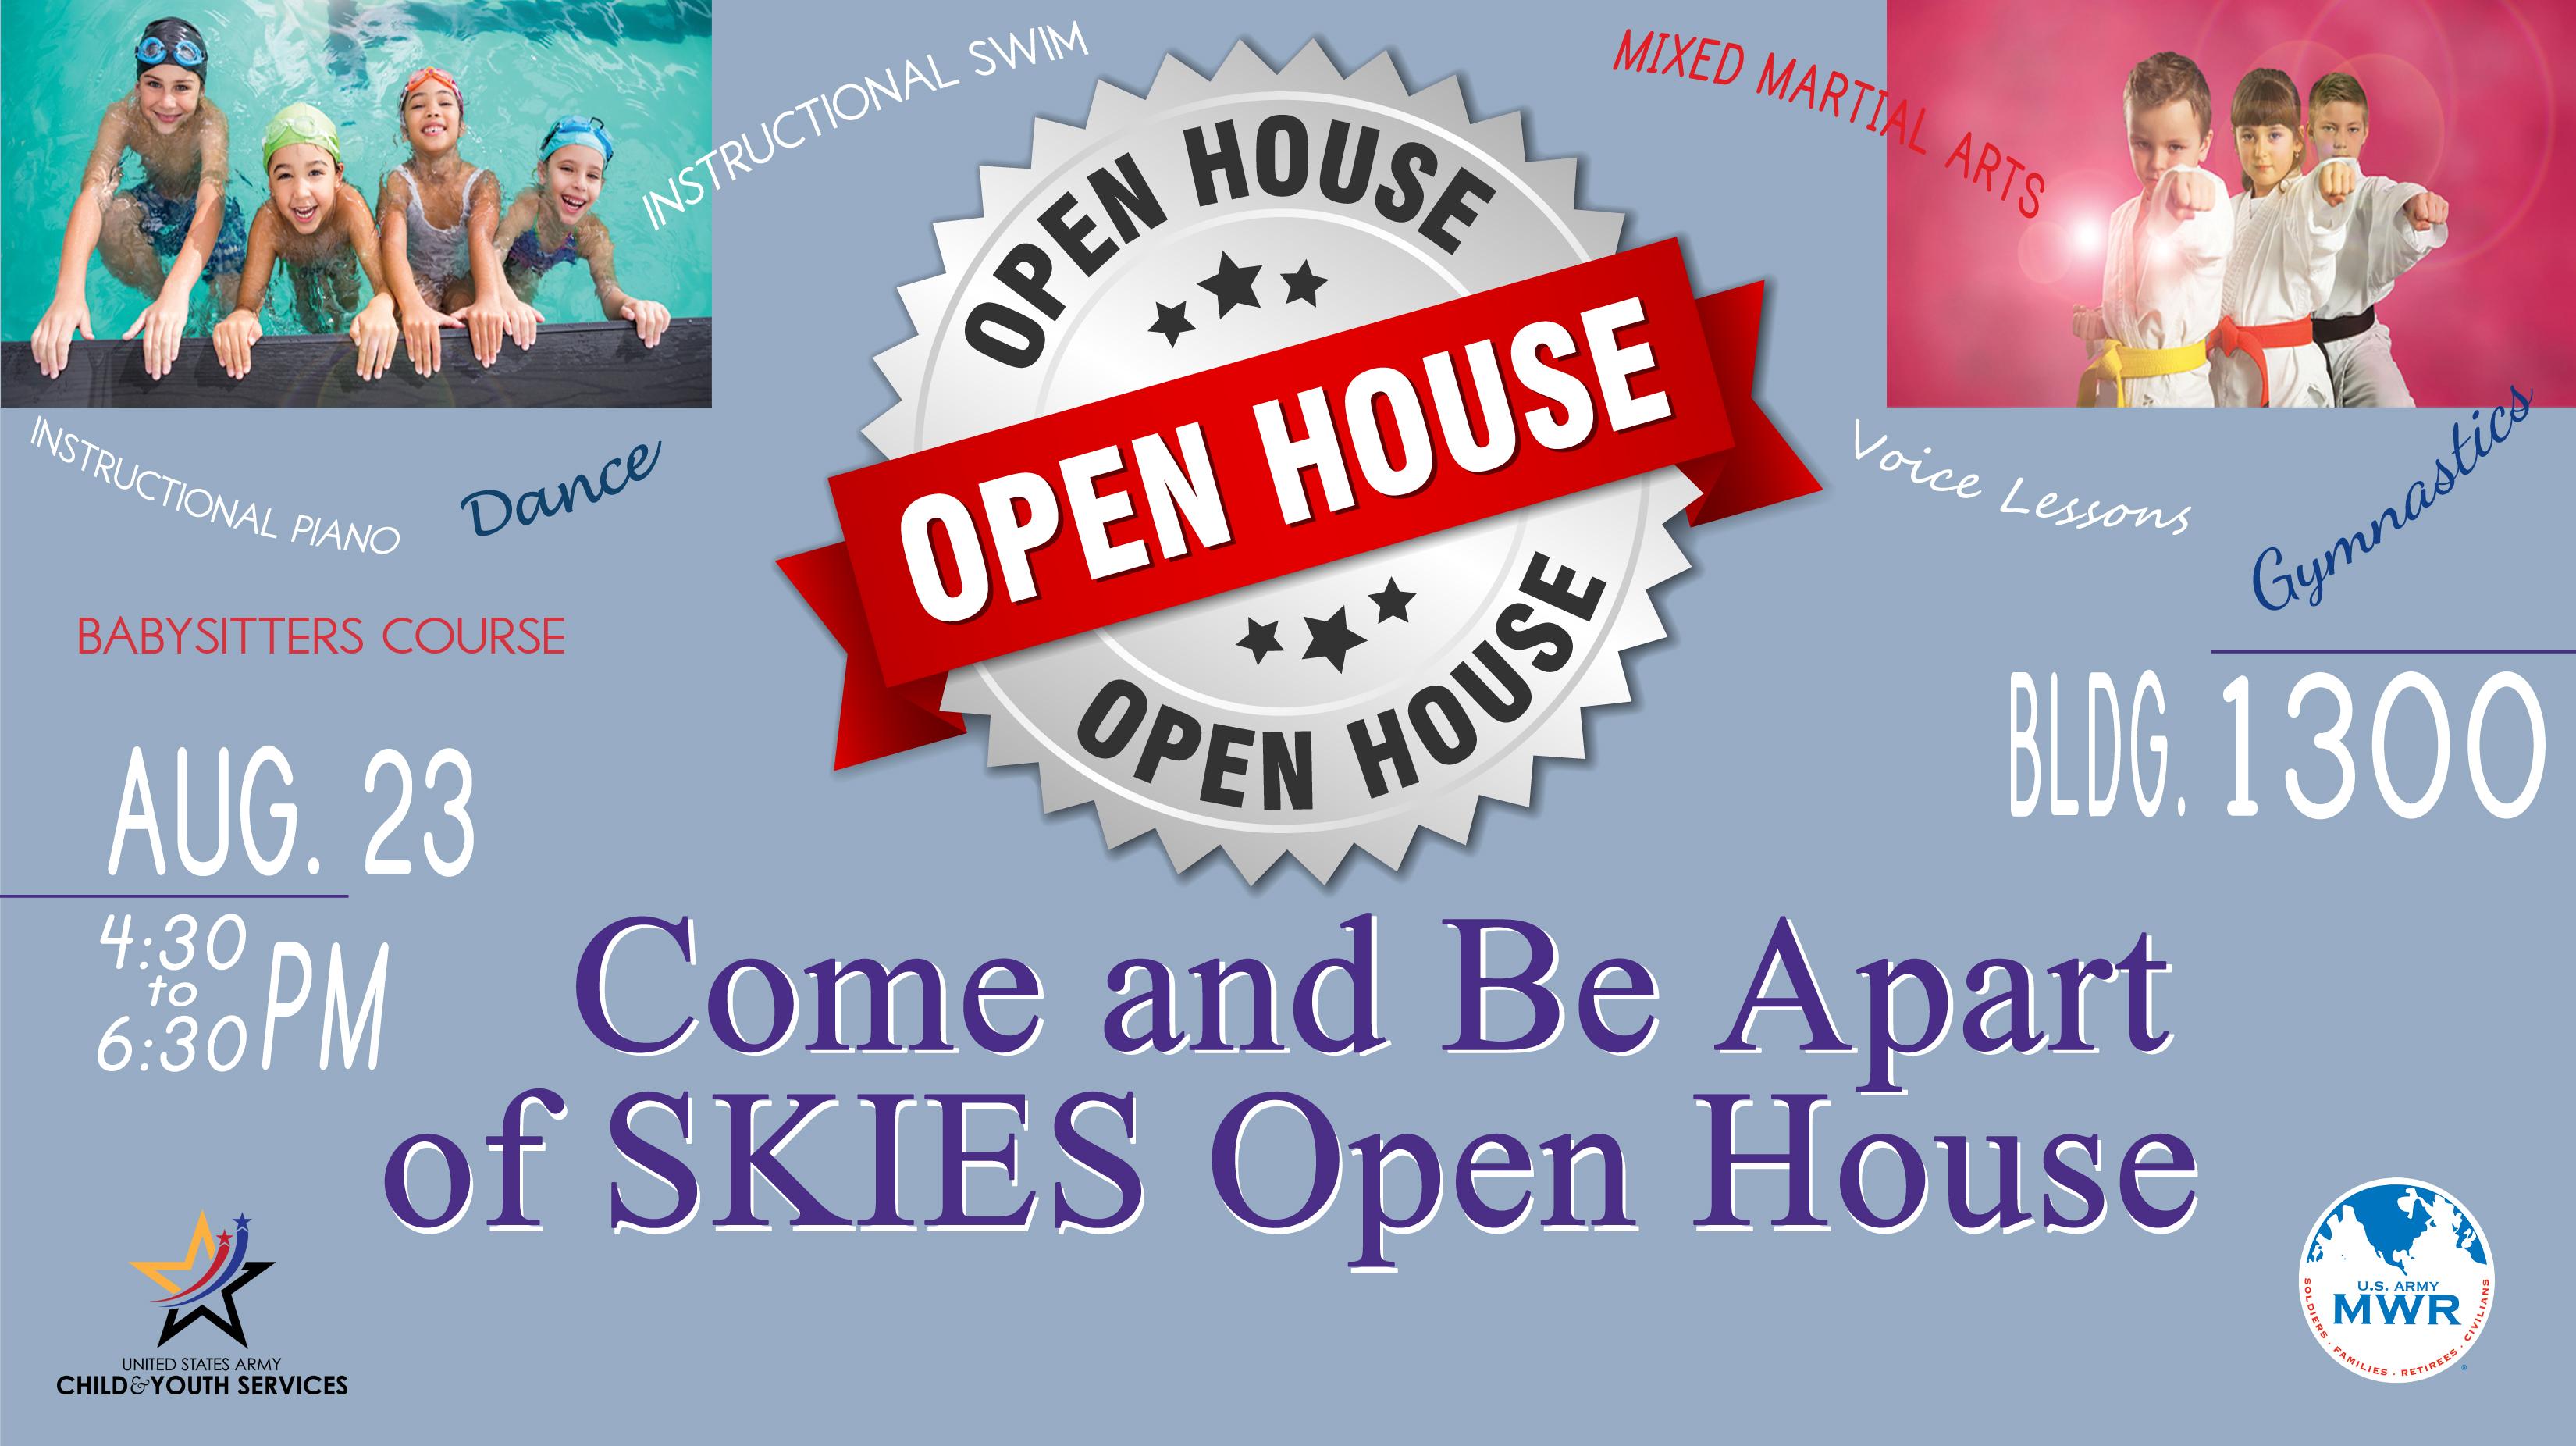 SKIES Open House